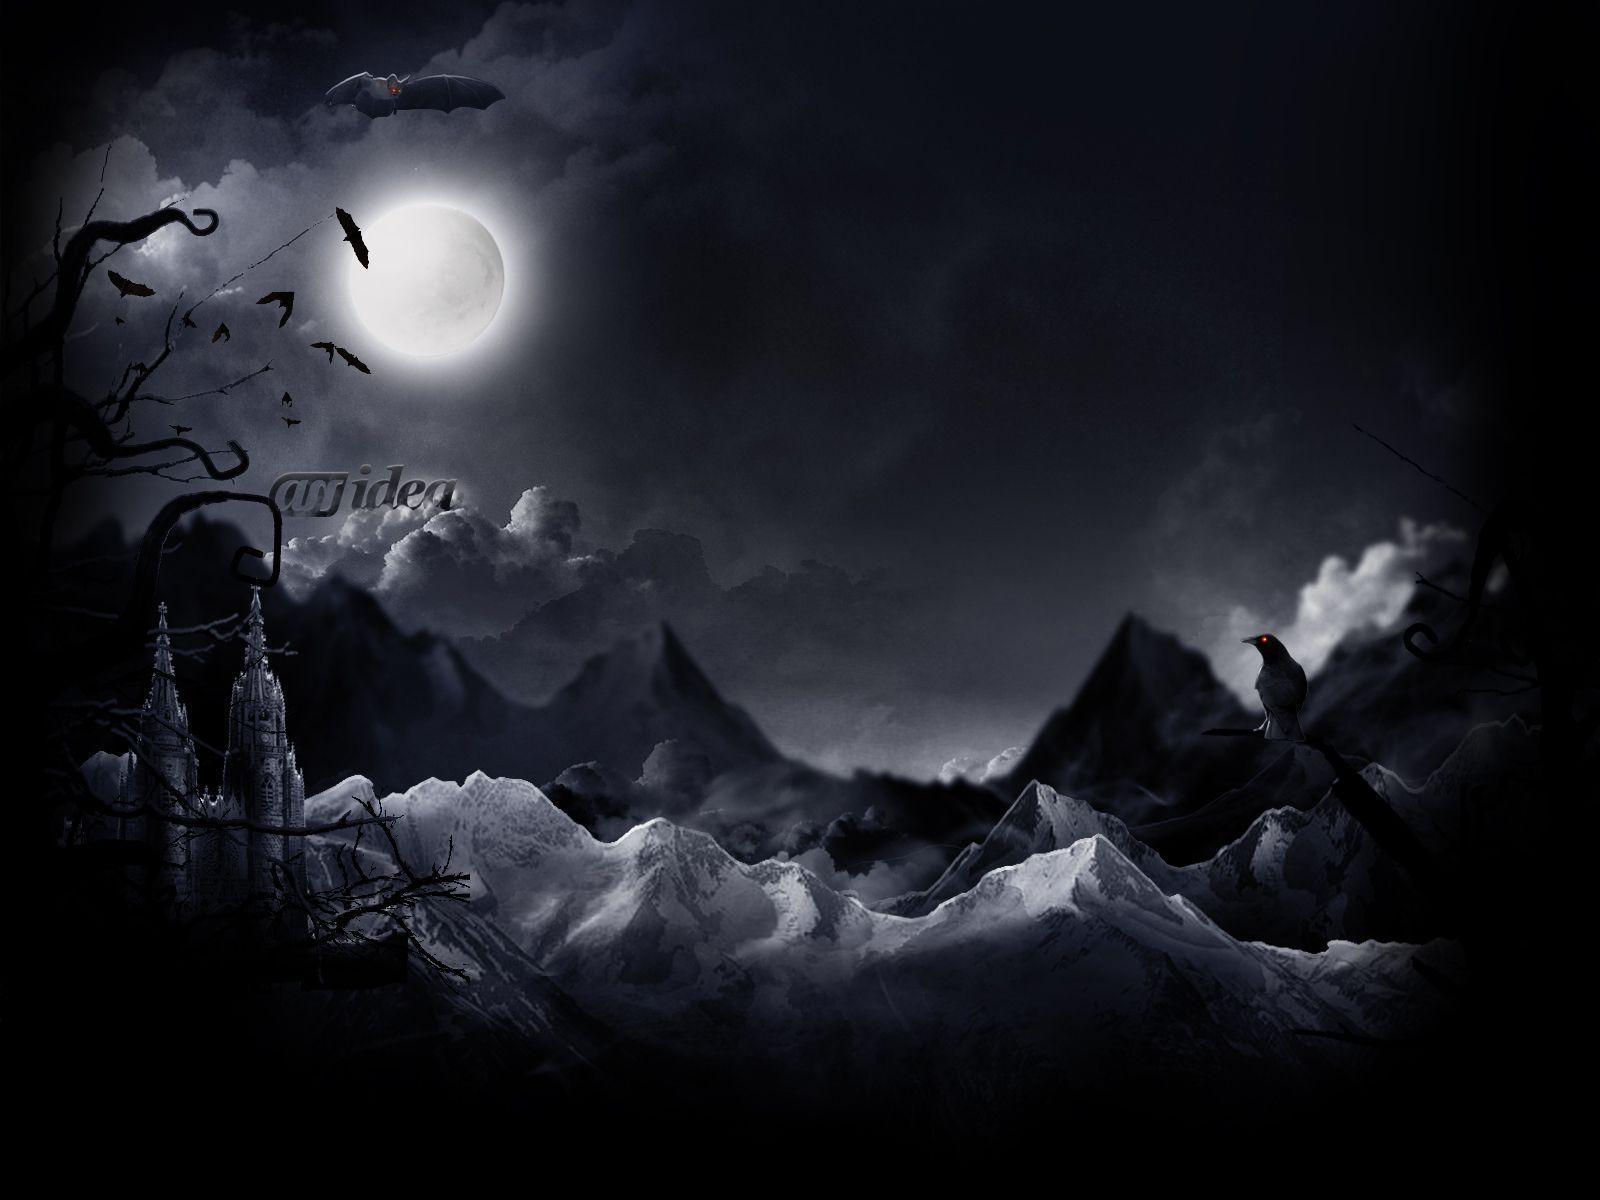 Dark Night With Moon Wallpapers Top Free Dark Night With Moon Backgrounds Wallpaperaccess